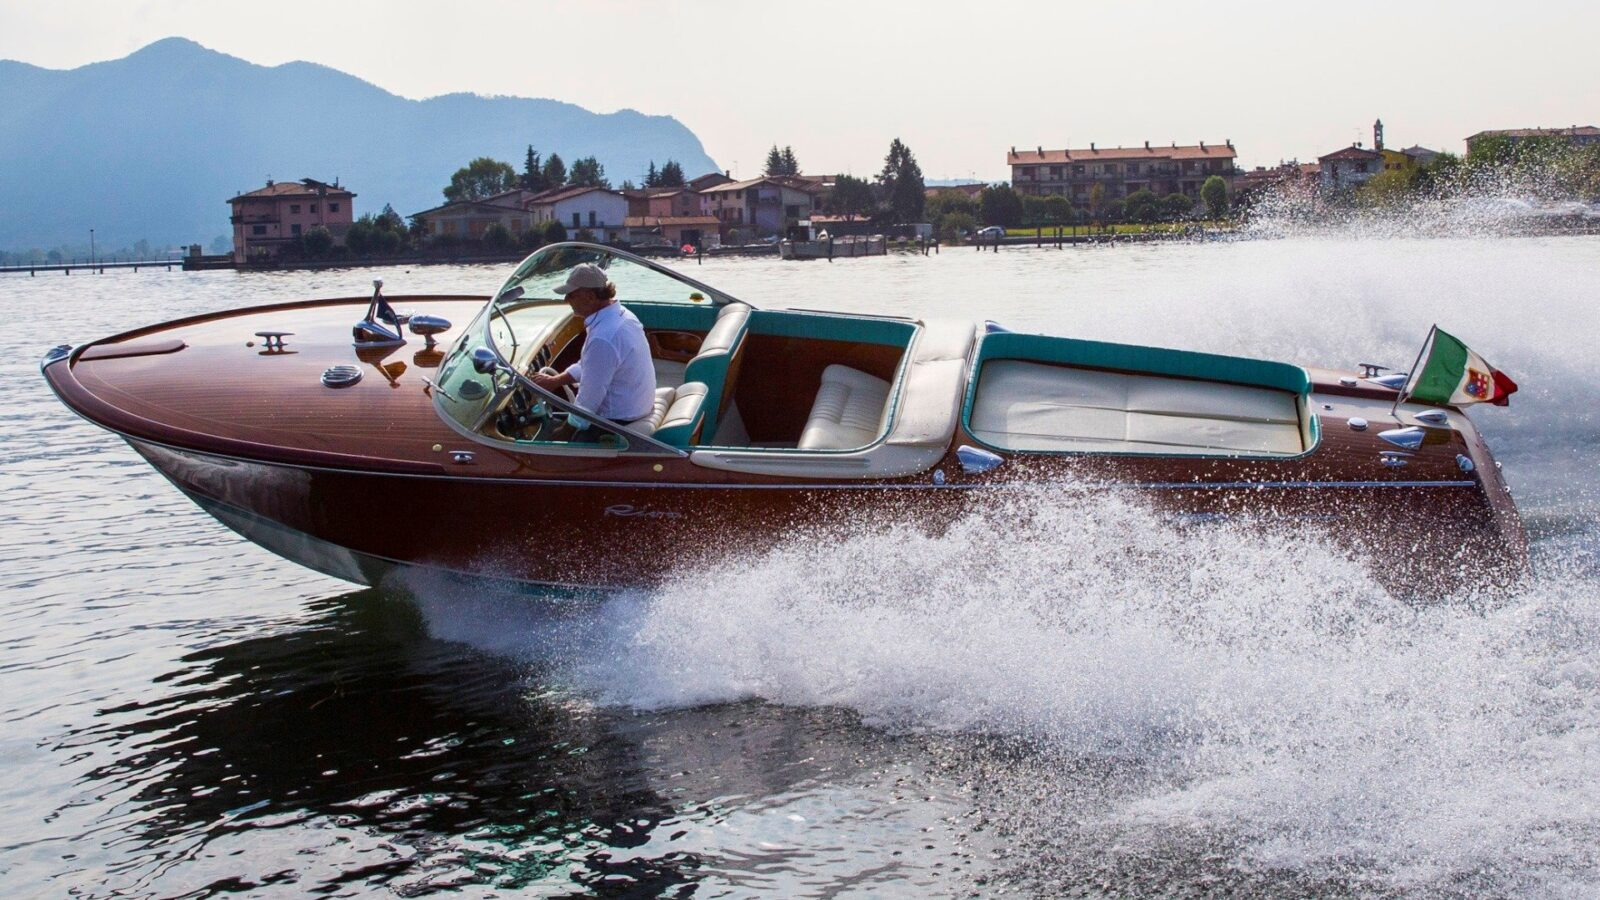 Hotel Principe di Savoia - Riva sailing experience